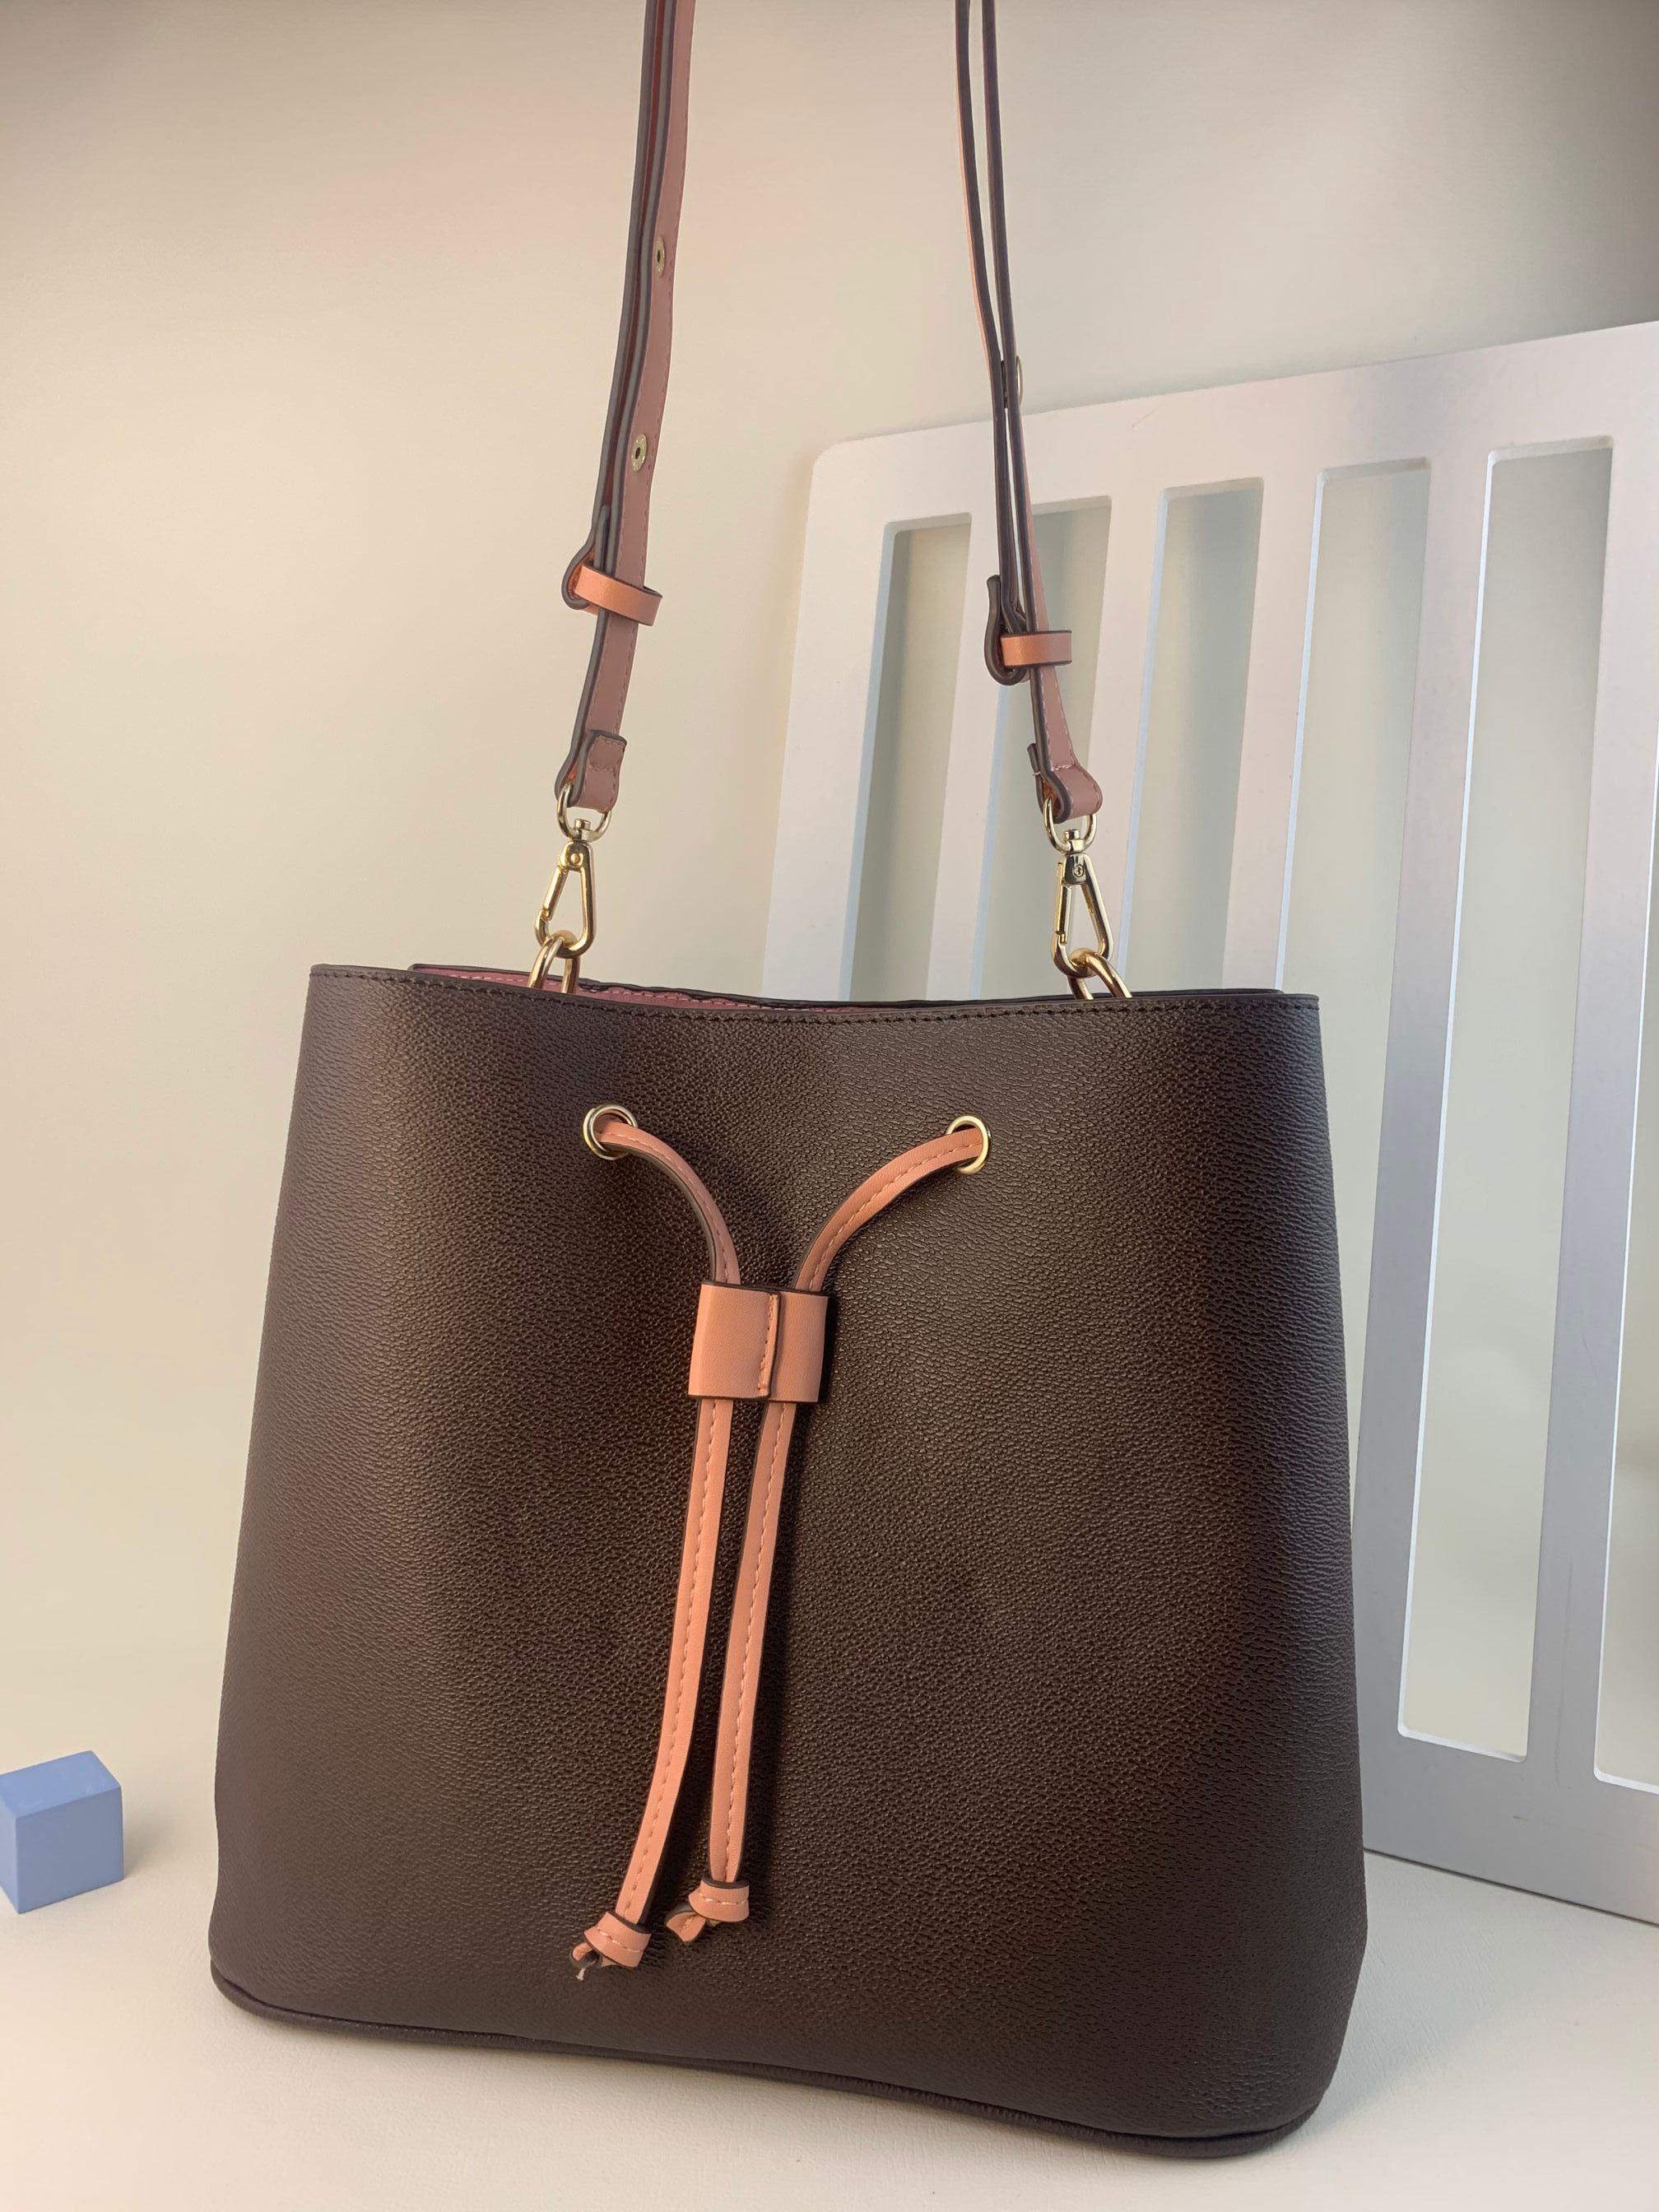 Casa estilo clássico feminino balde bolsas de ombro escale neonoe saco crossbody bolsas de couro genuíno Ajustável cinta nova moda sacos bolsa